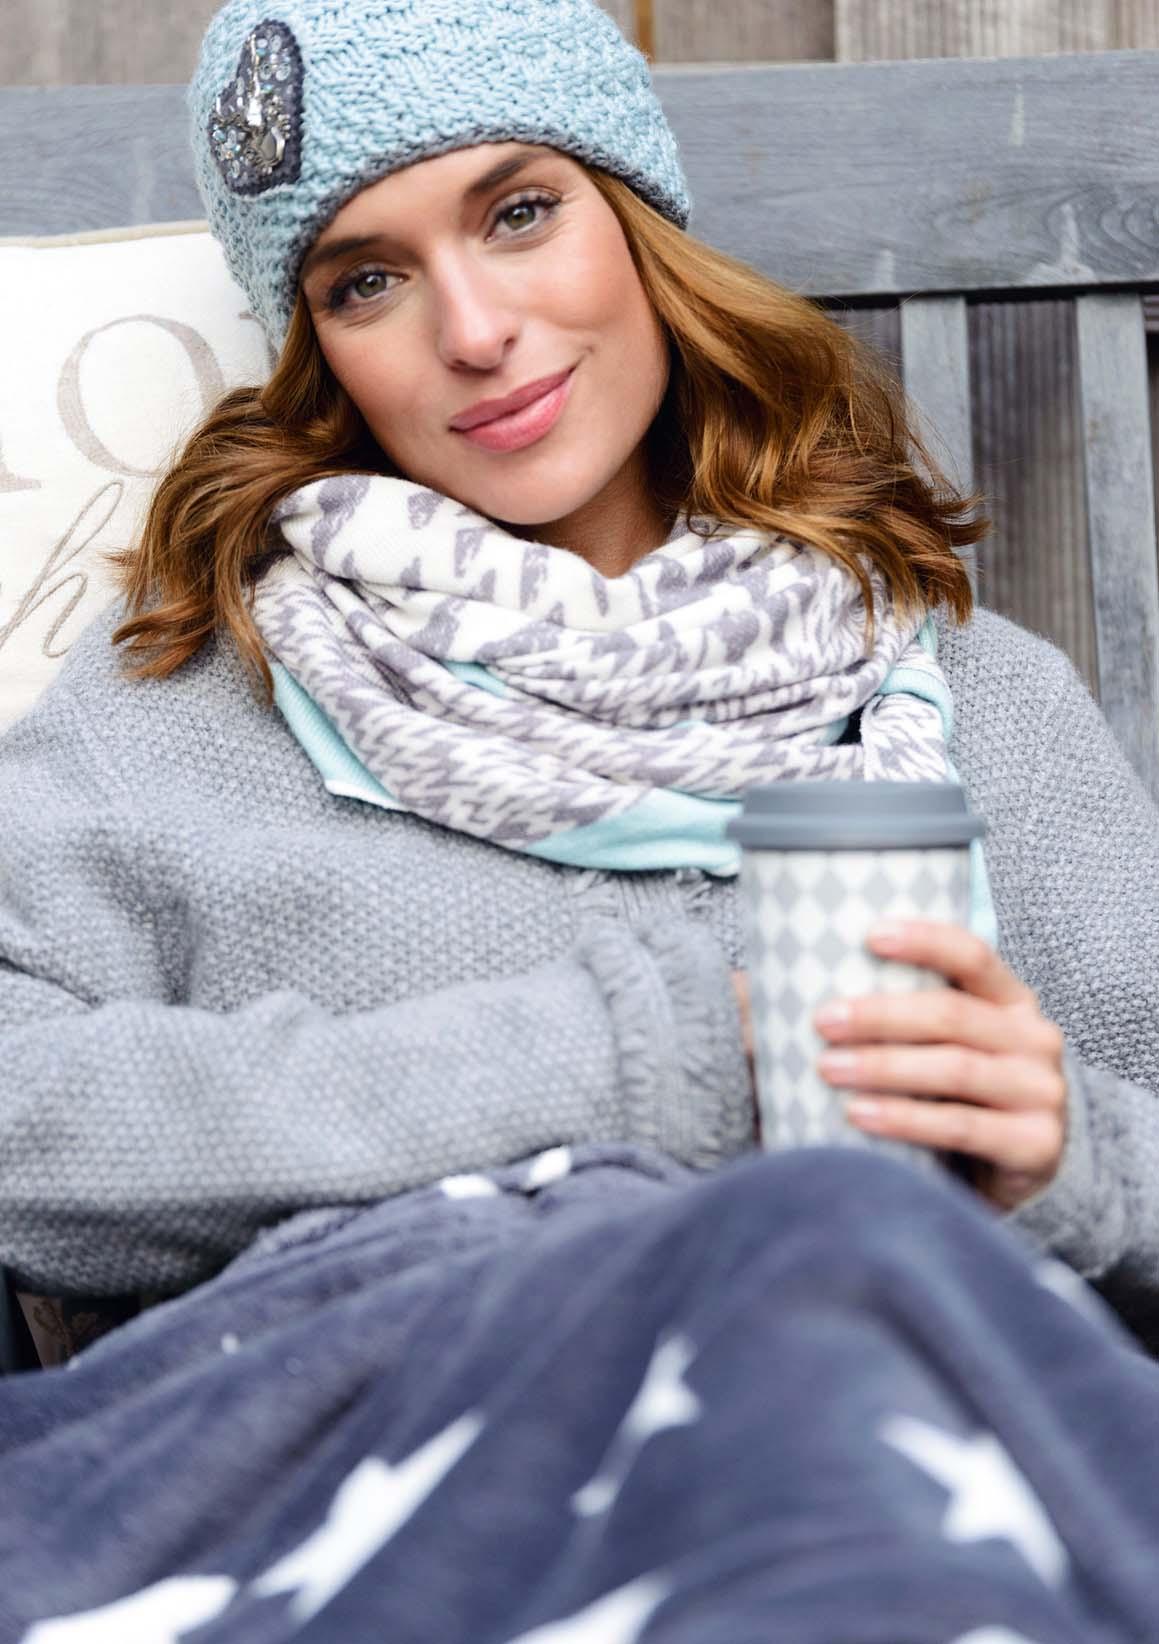 Janina im Winterlook trinkt Tee